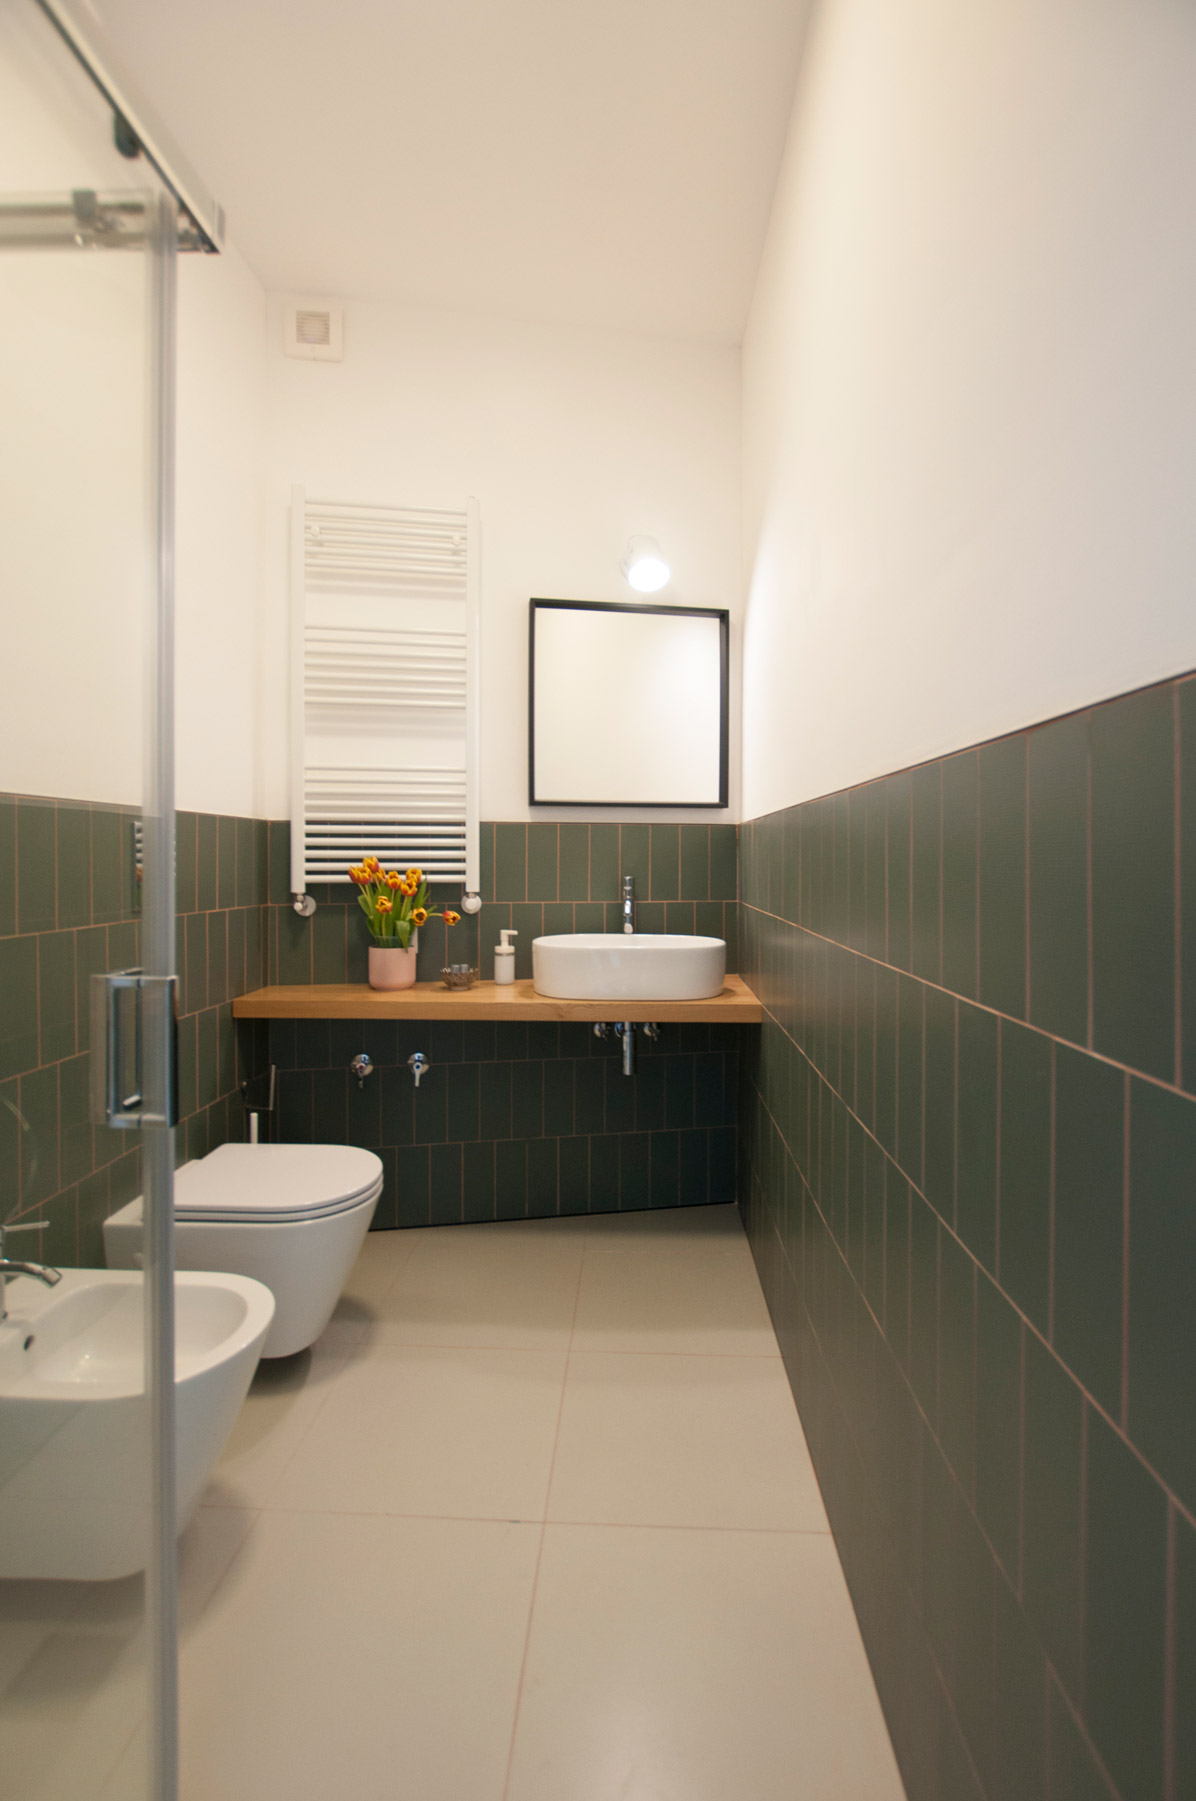 bagno-monolocale-casa27-b&b-terracina